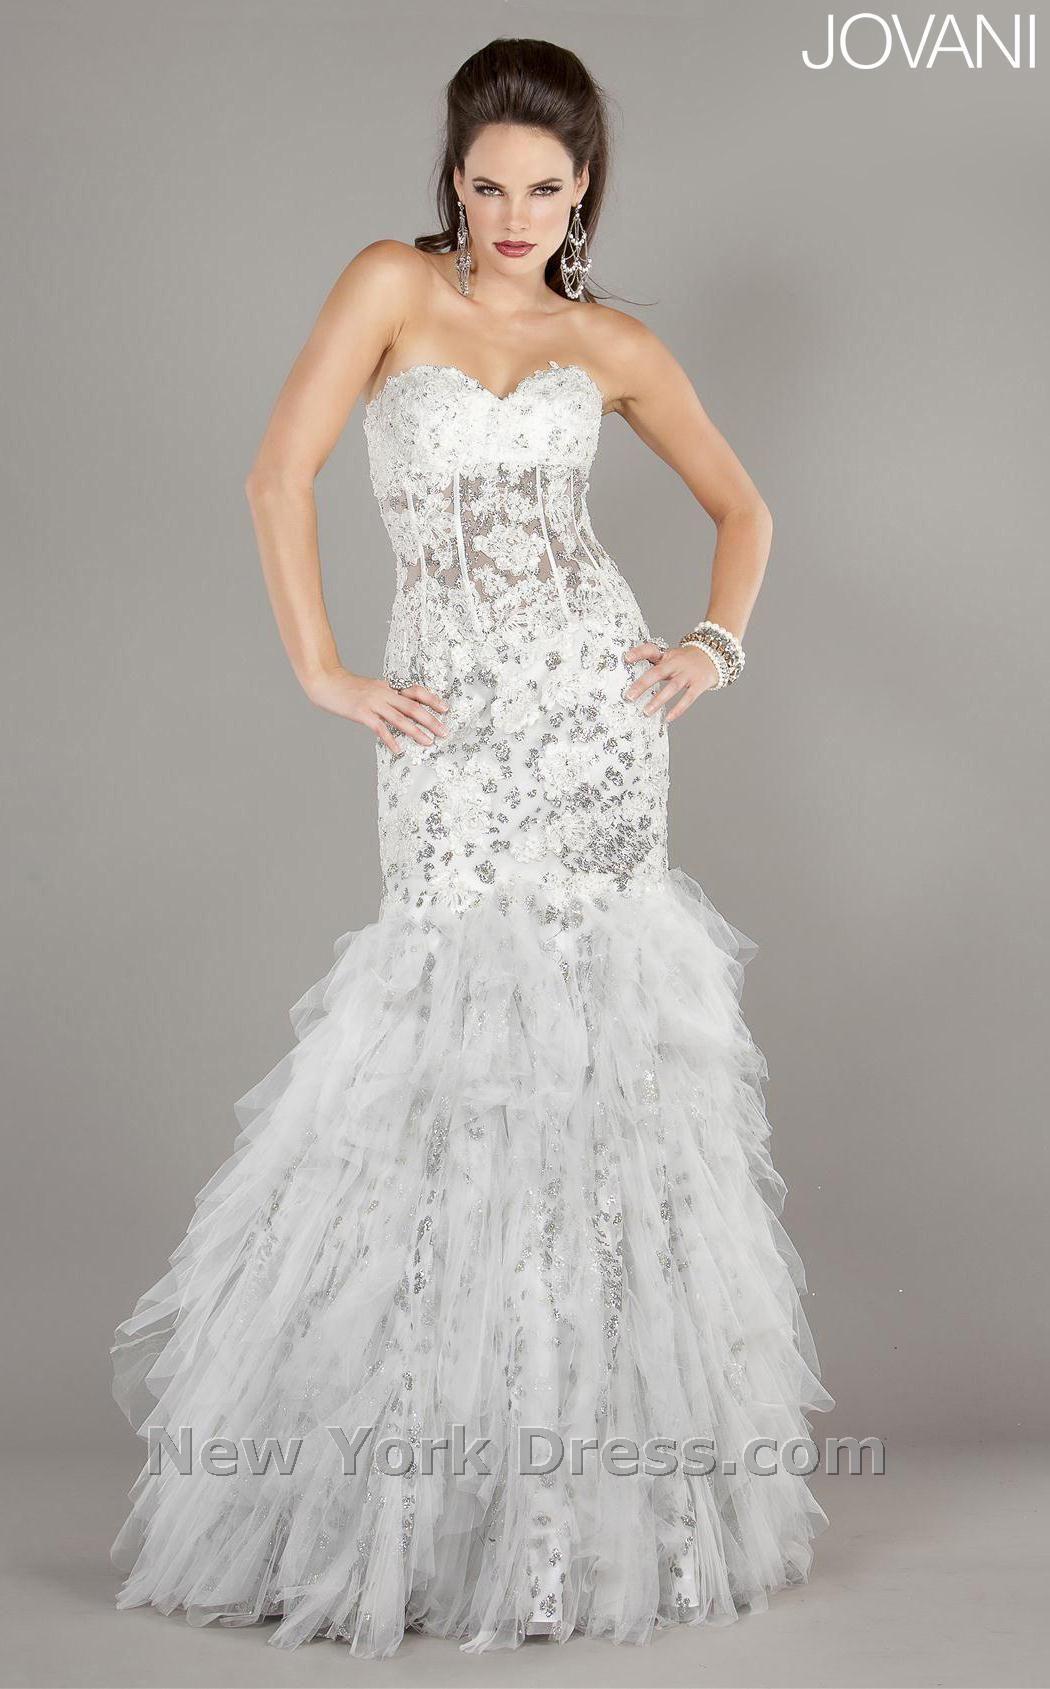 Jovani dress shops wedding and blog